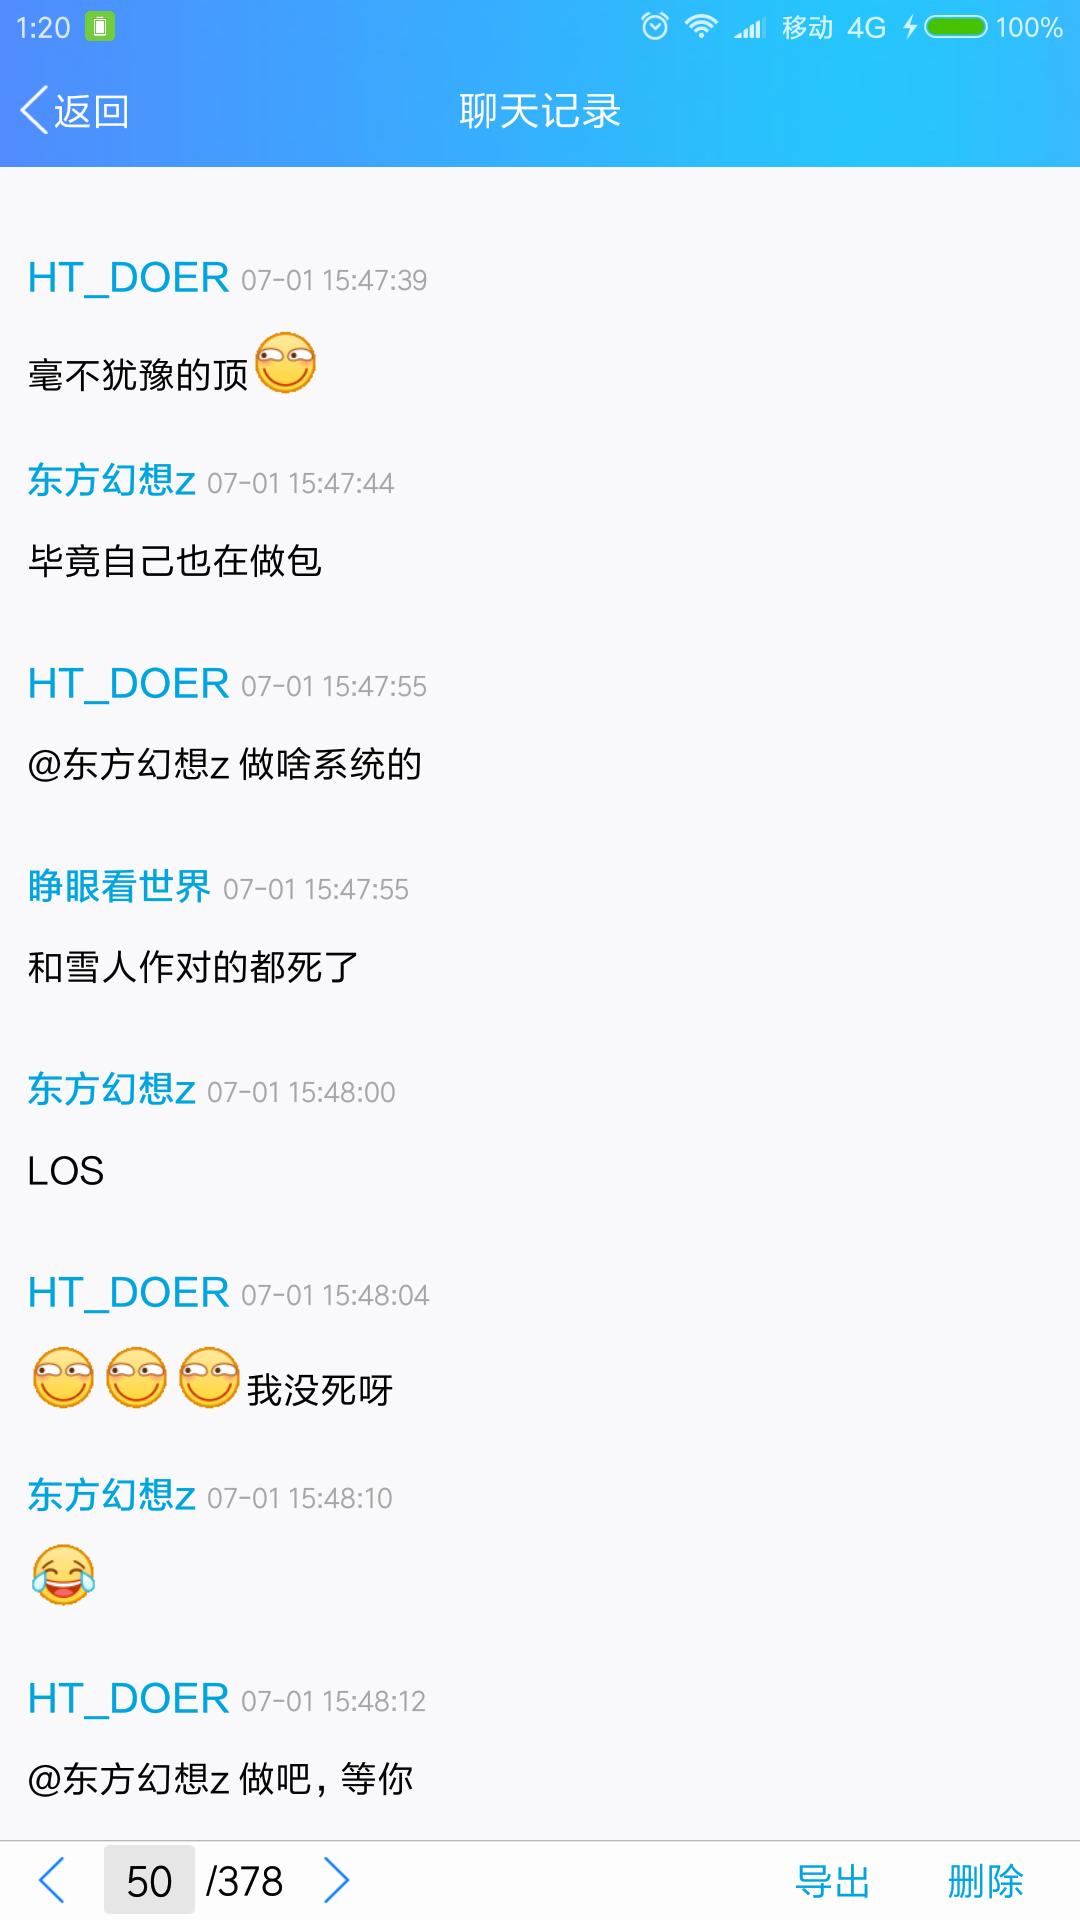 Screenshot_2017-07-09-01-20-44-860_com.tencent.mobileqq.png